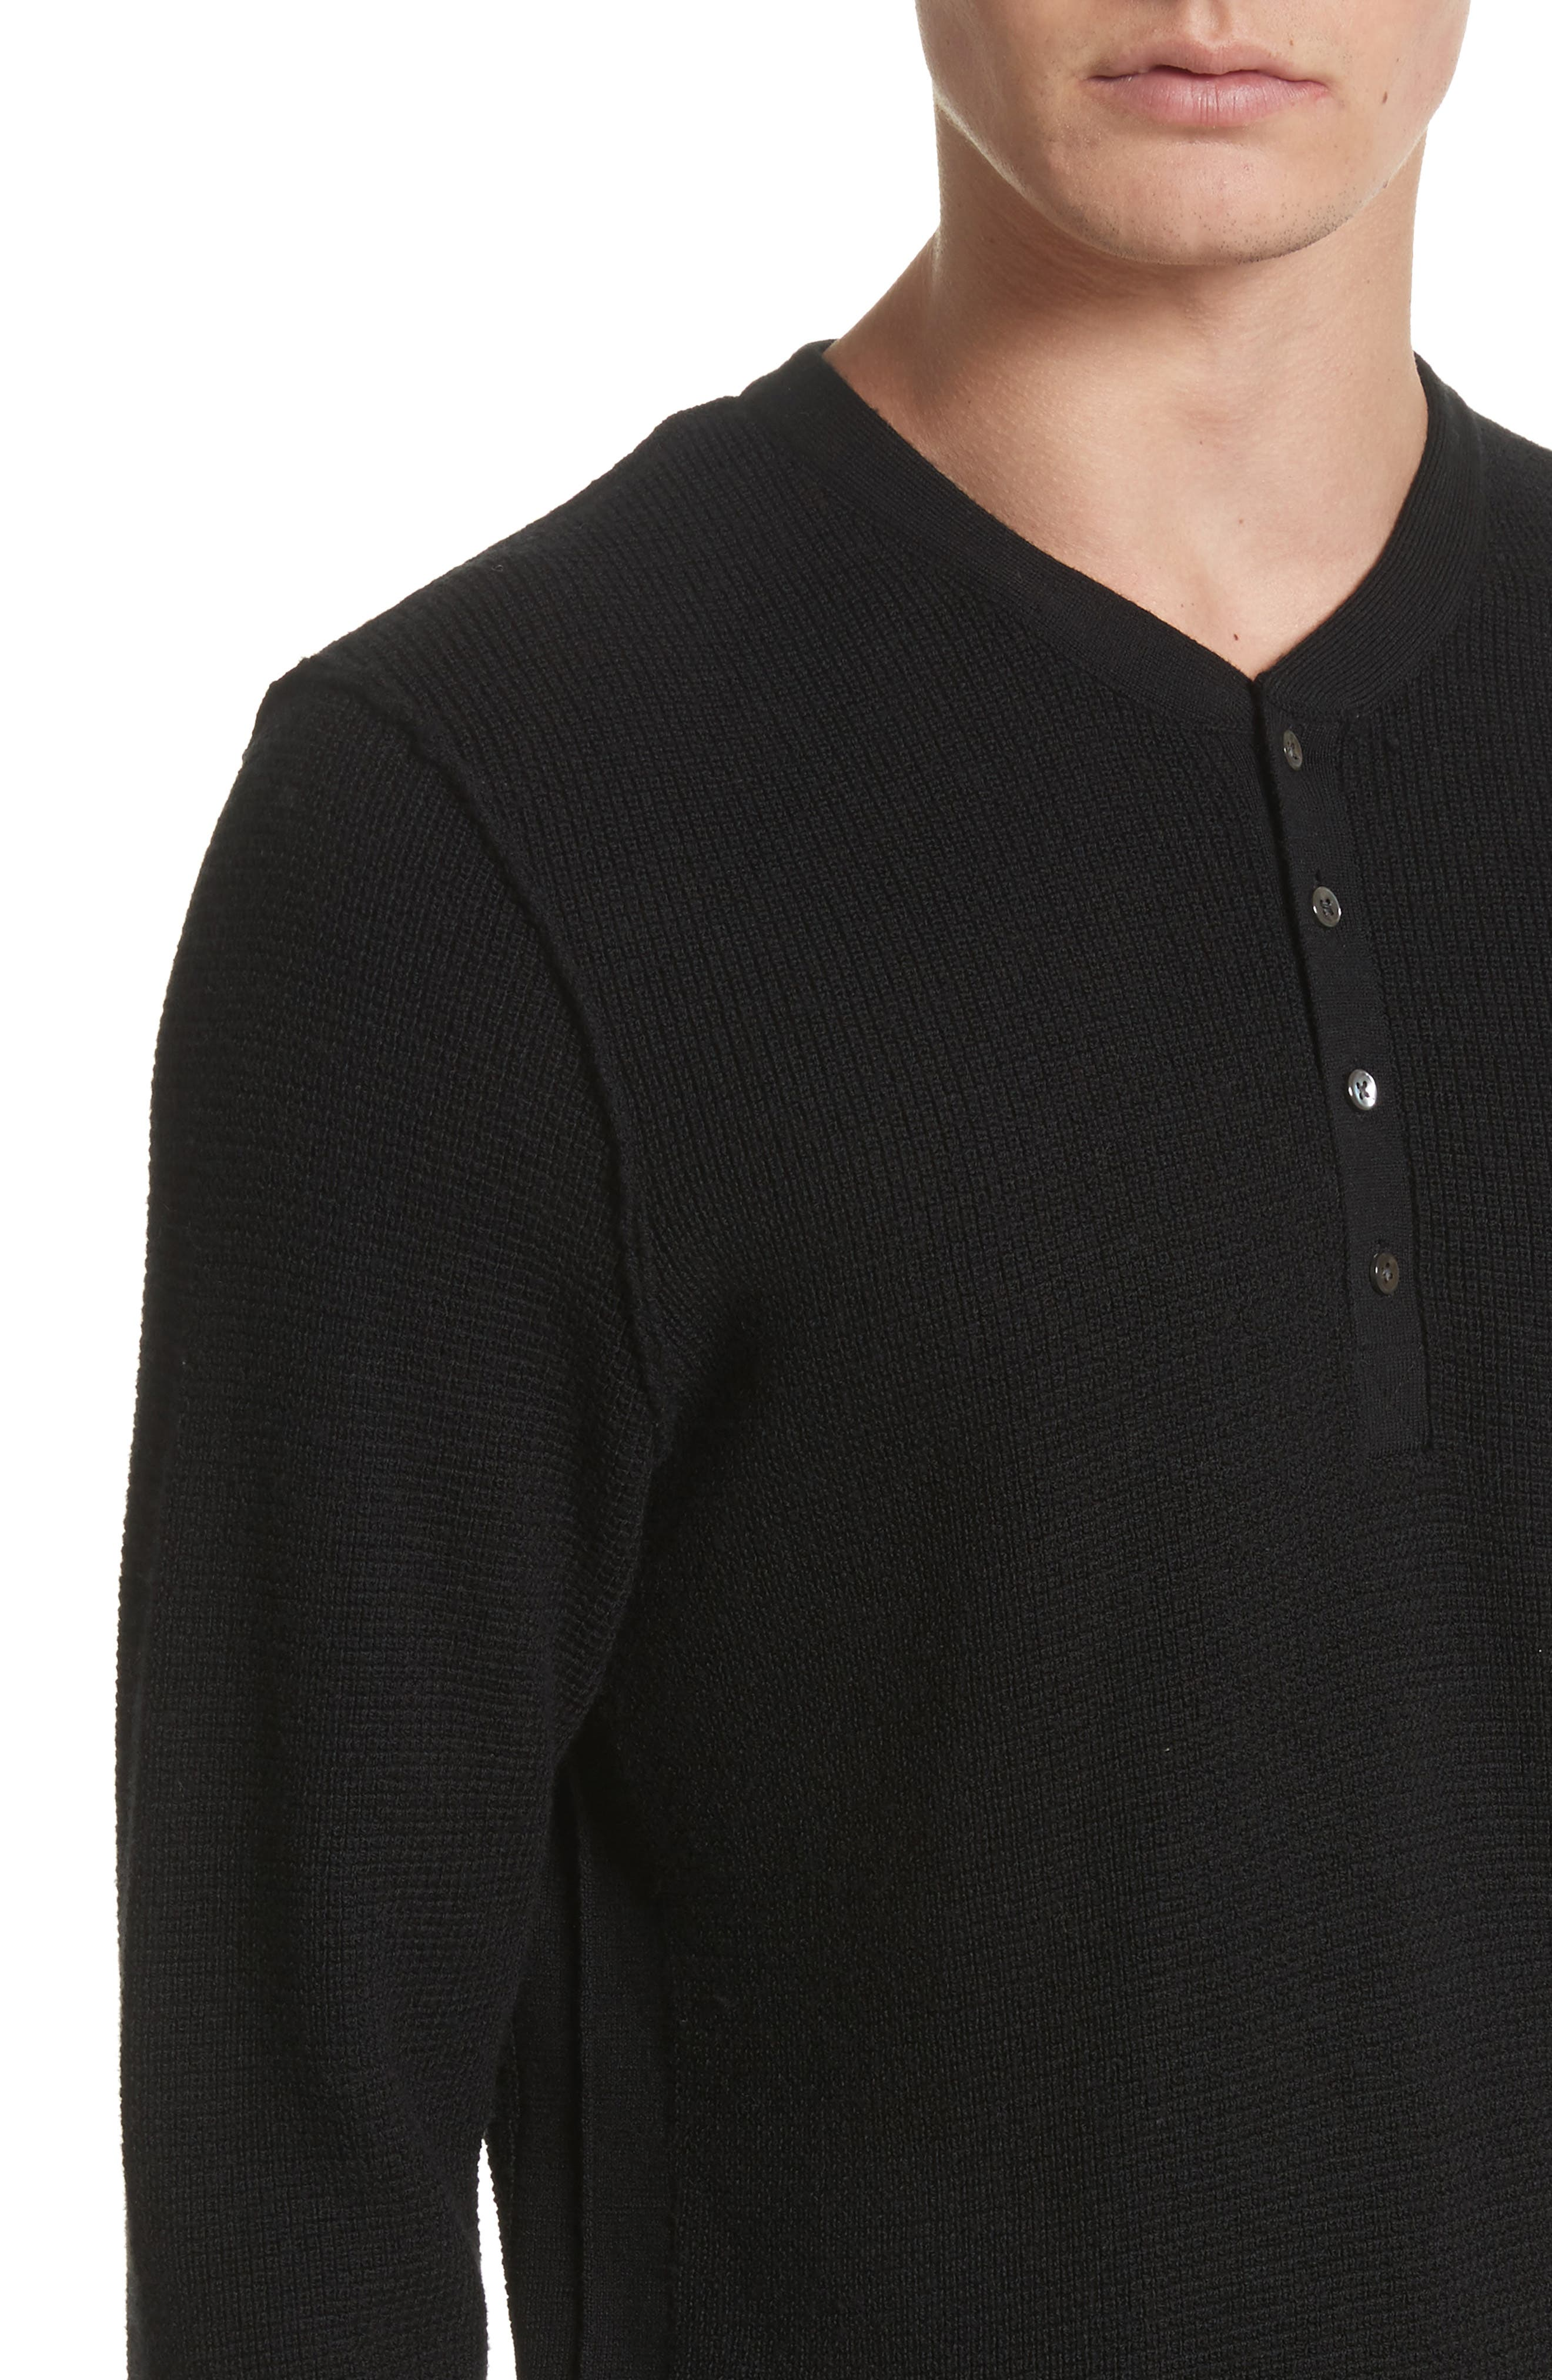 Long Sleeve Wool Henley,                             Alternate thumbnail 4, color,                             Black